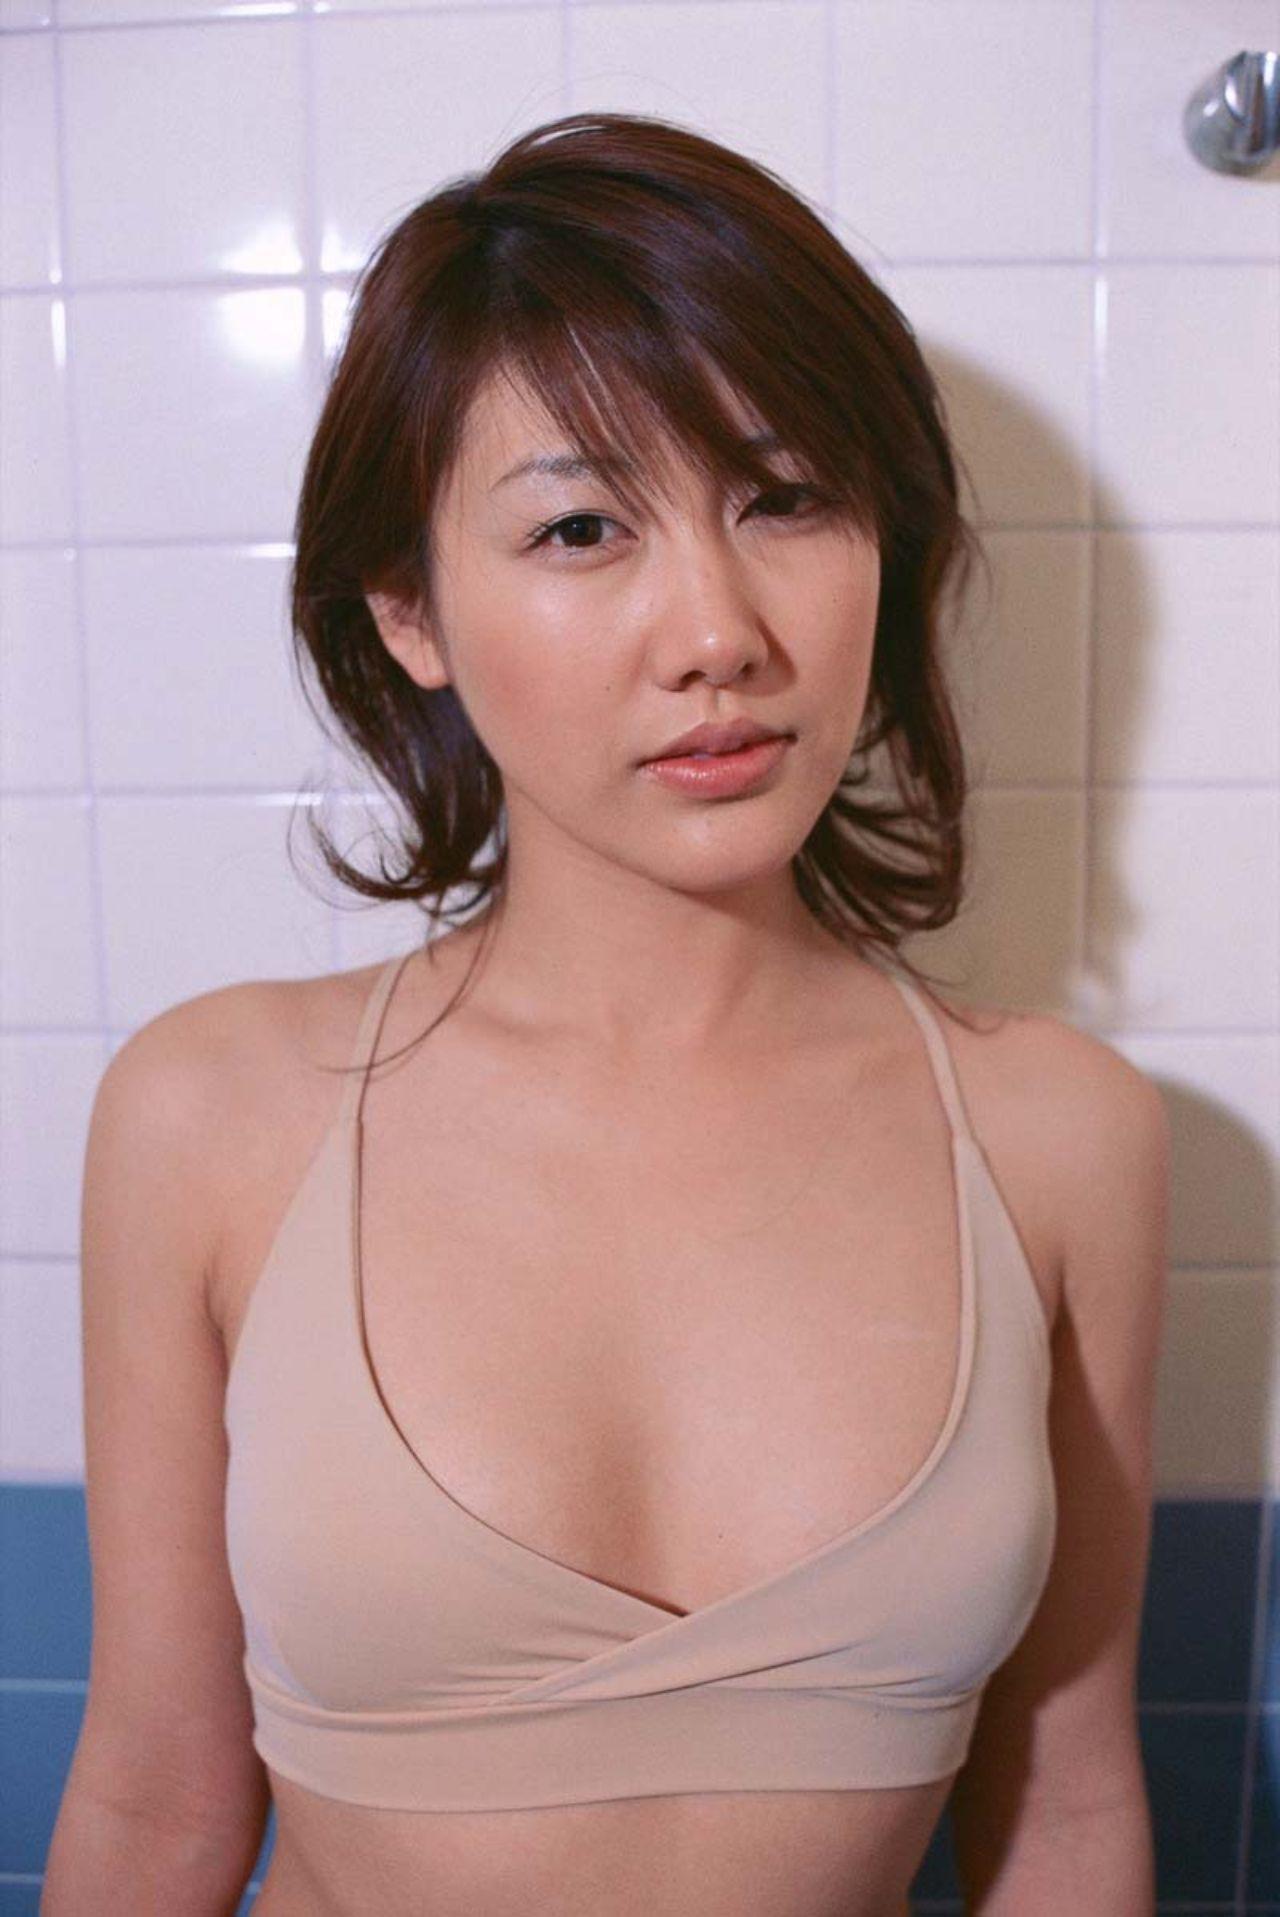 megumi yasu Megumi Yasu